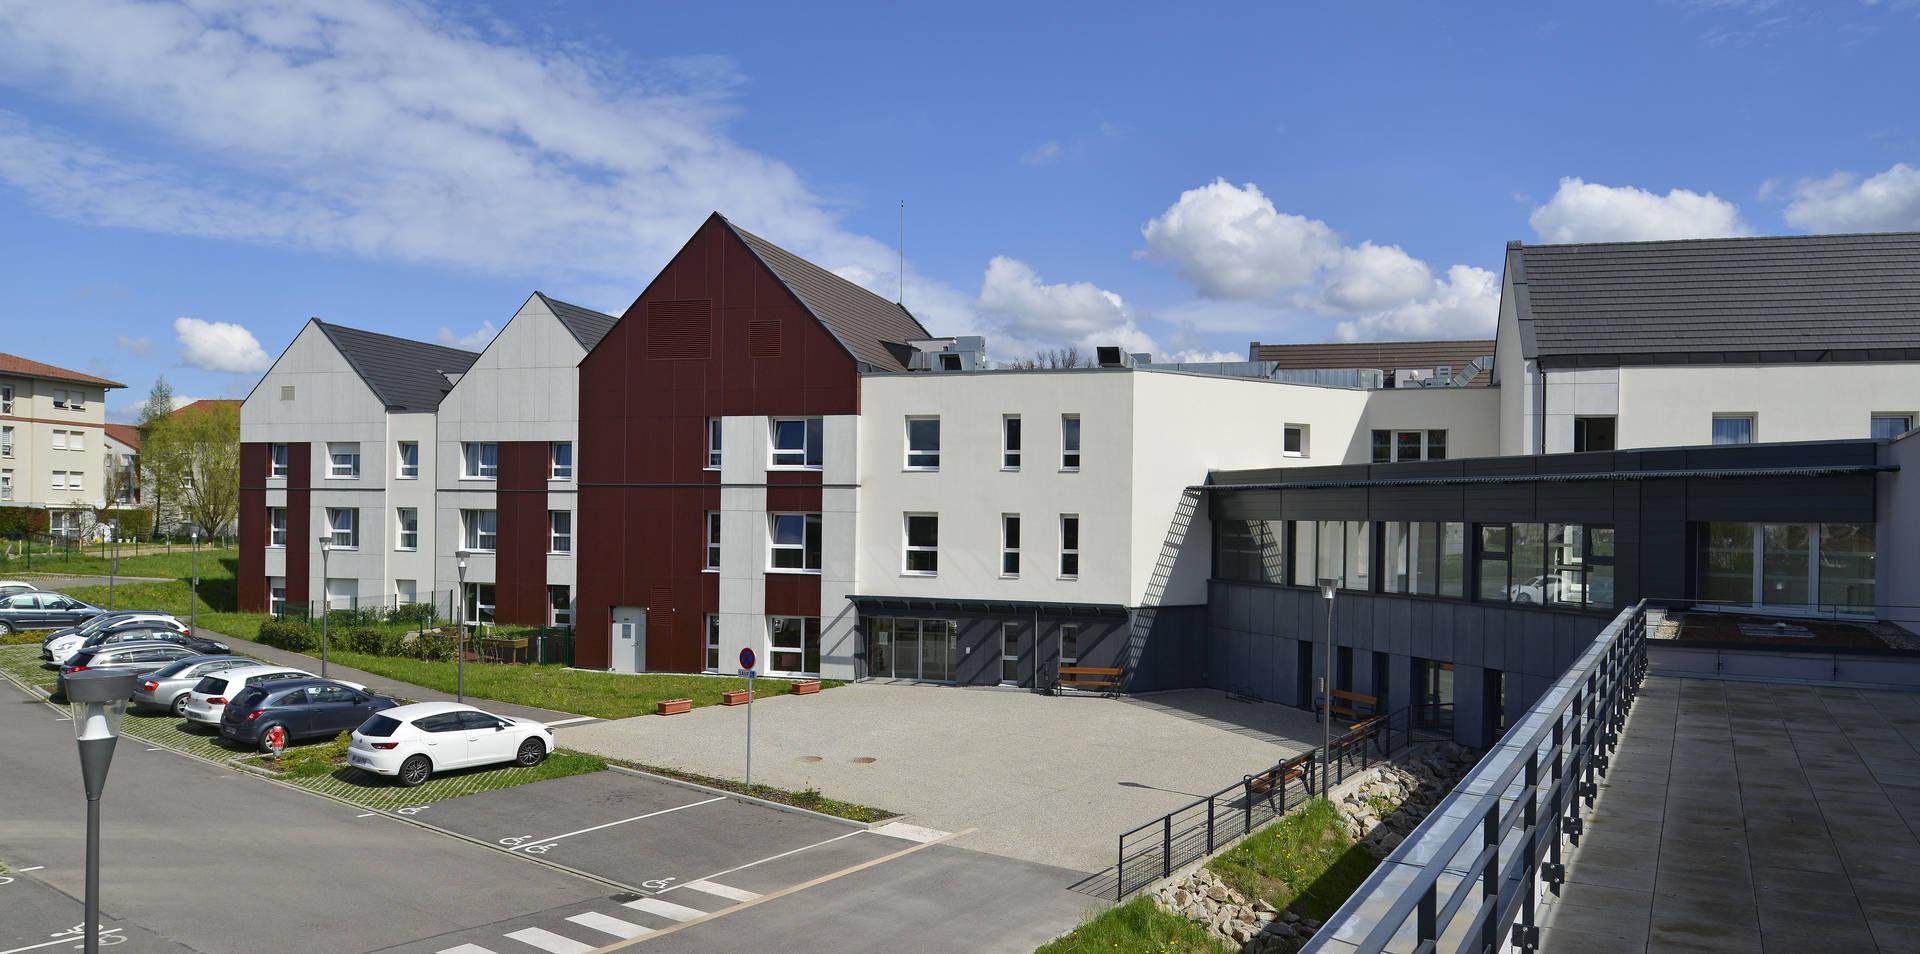 EHPAD, Hôpital Graffenbourg à Brumath